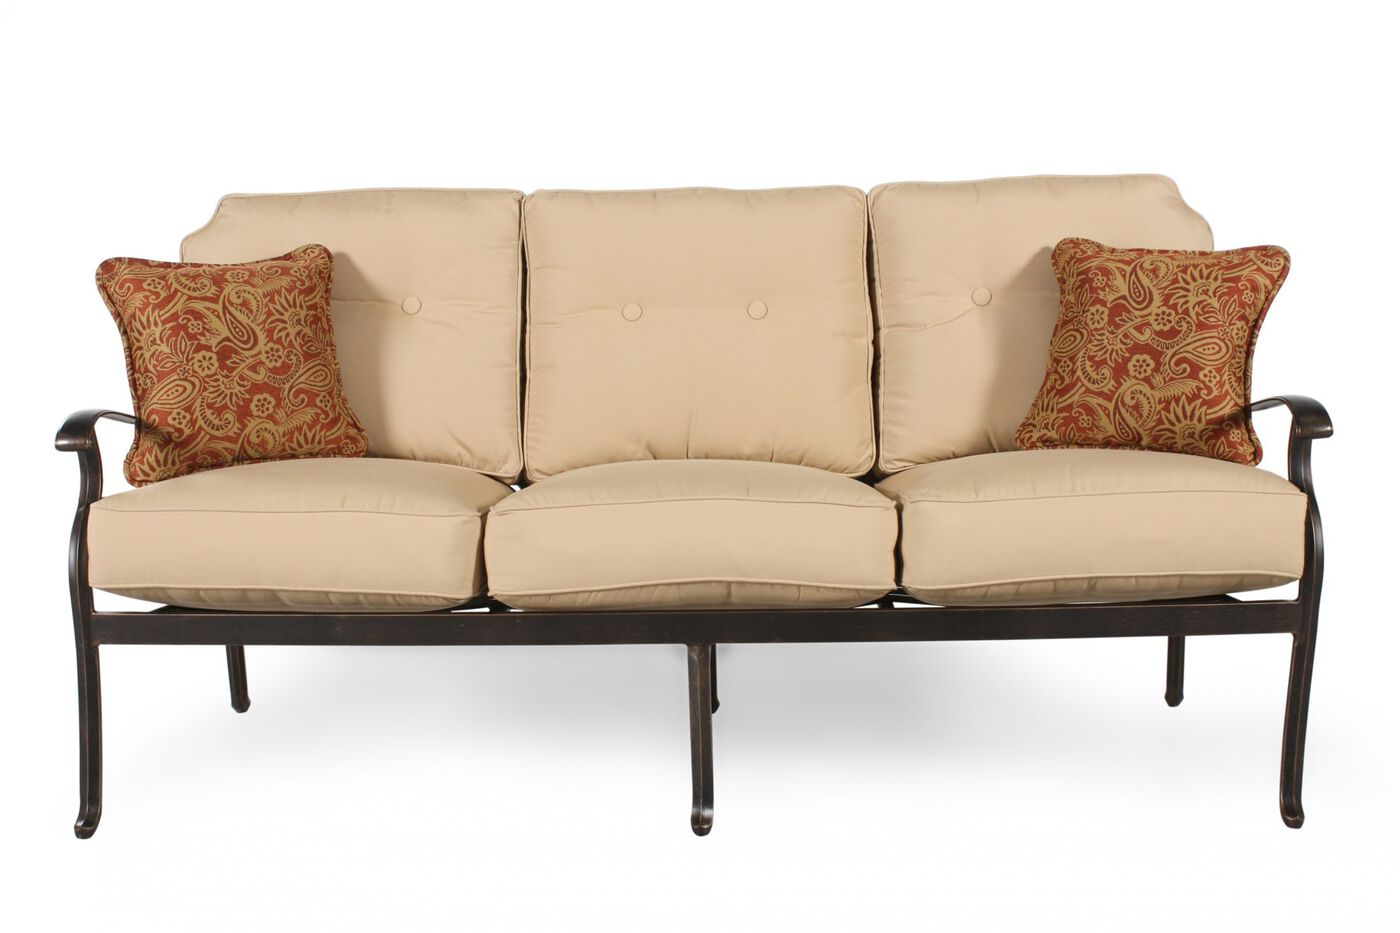 Mathis Brothers Patio Furniture agio heritage select patio sofa | mathis brothers furniture